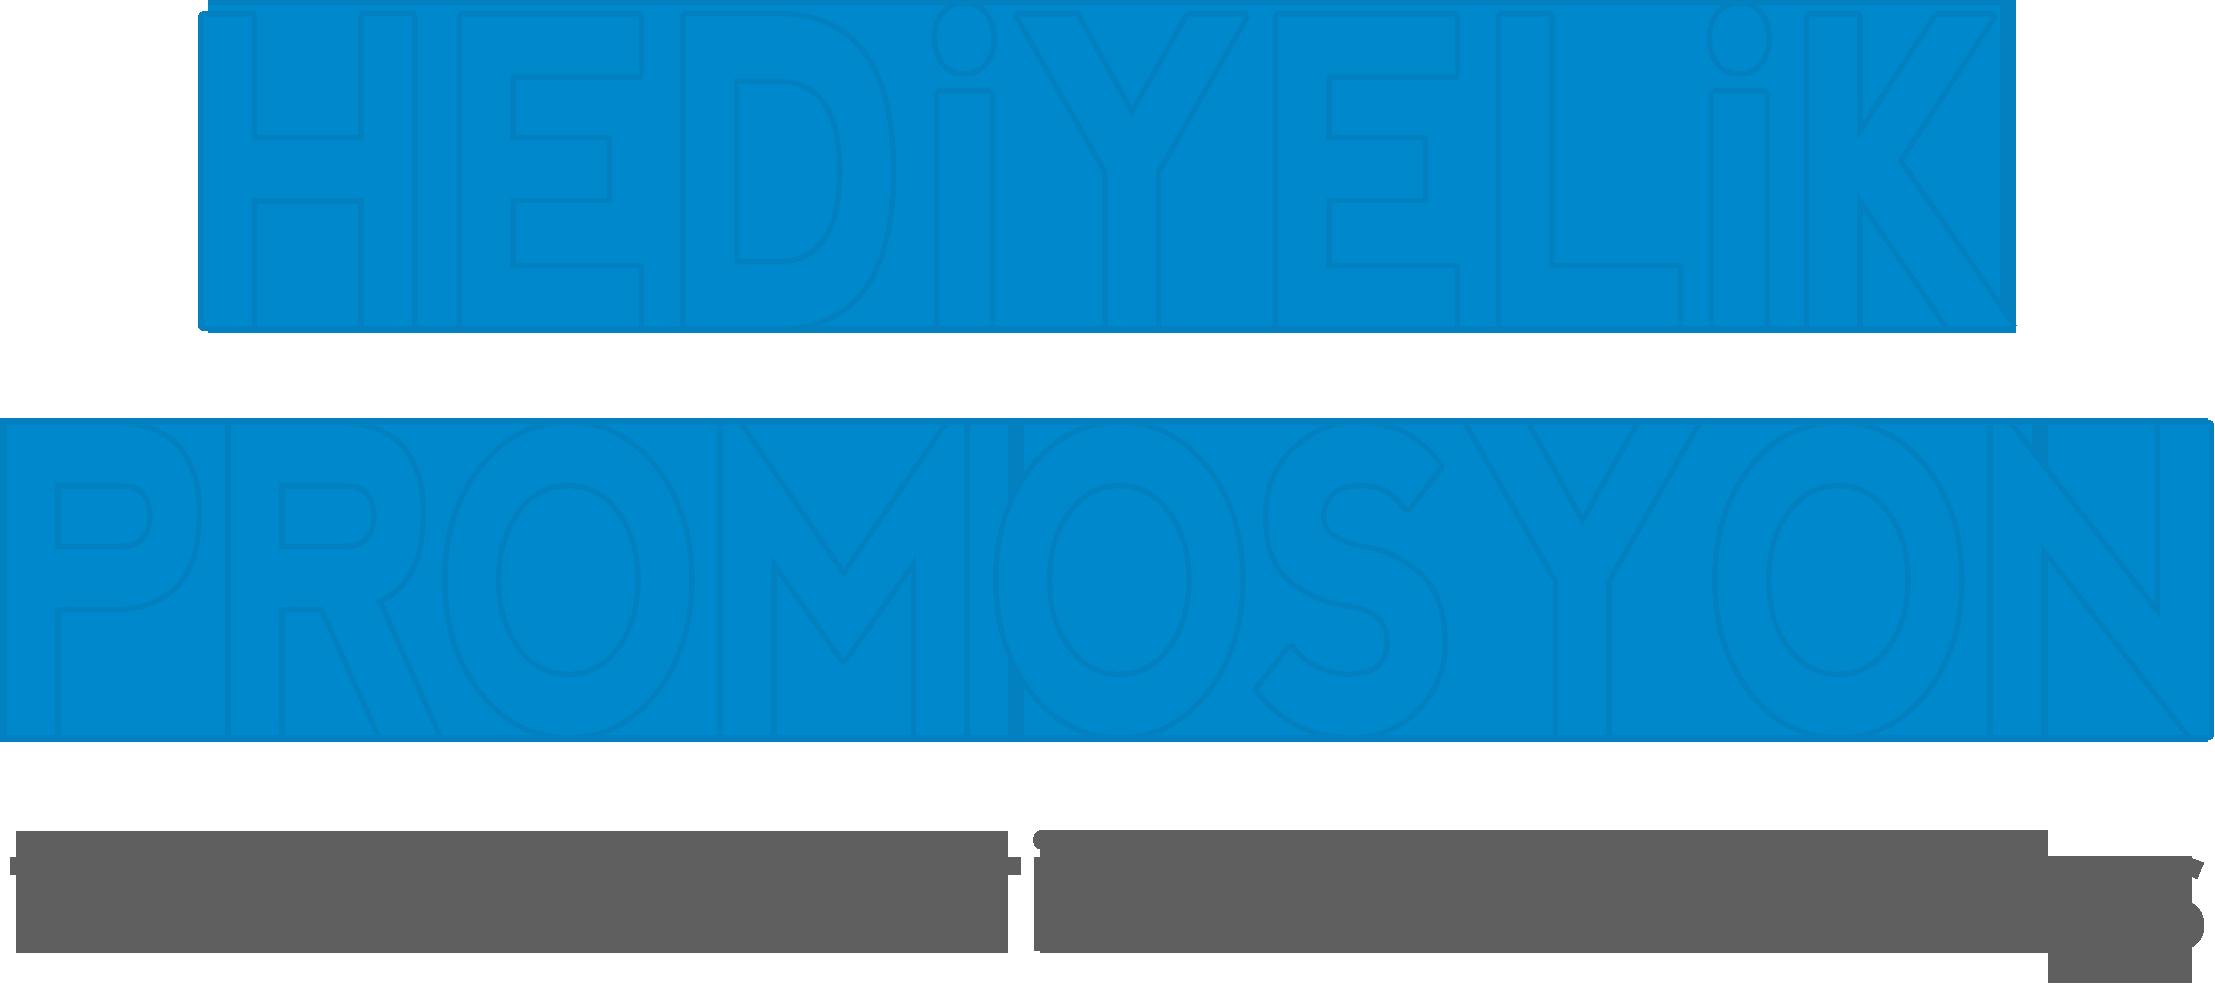 Hediyelik Promosyon Logo